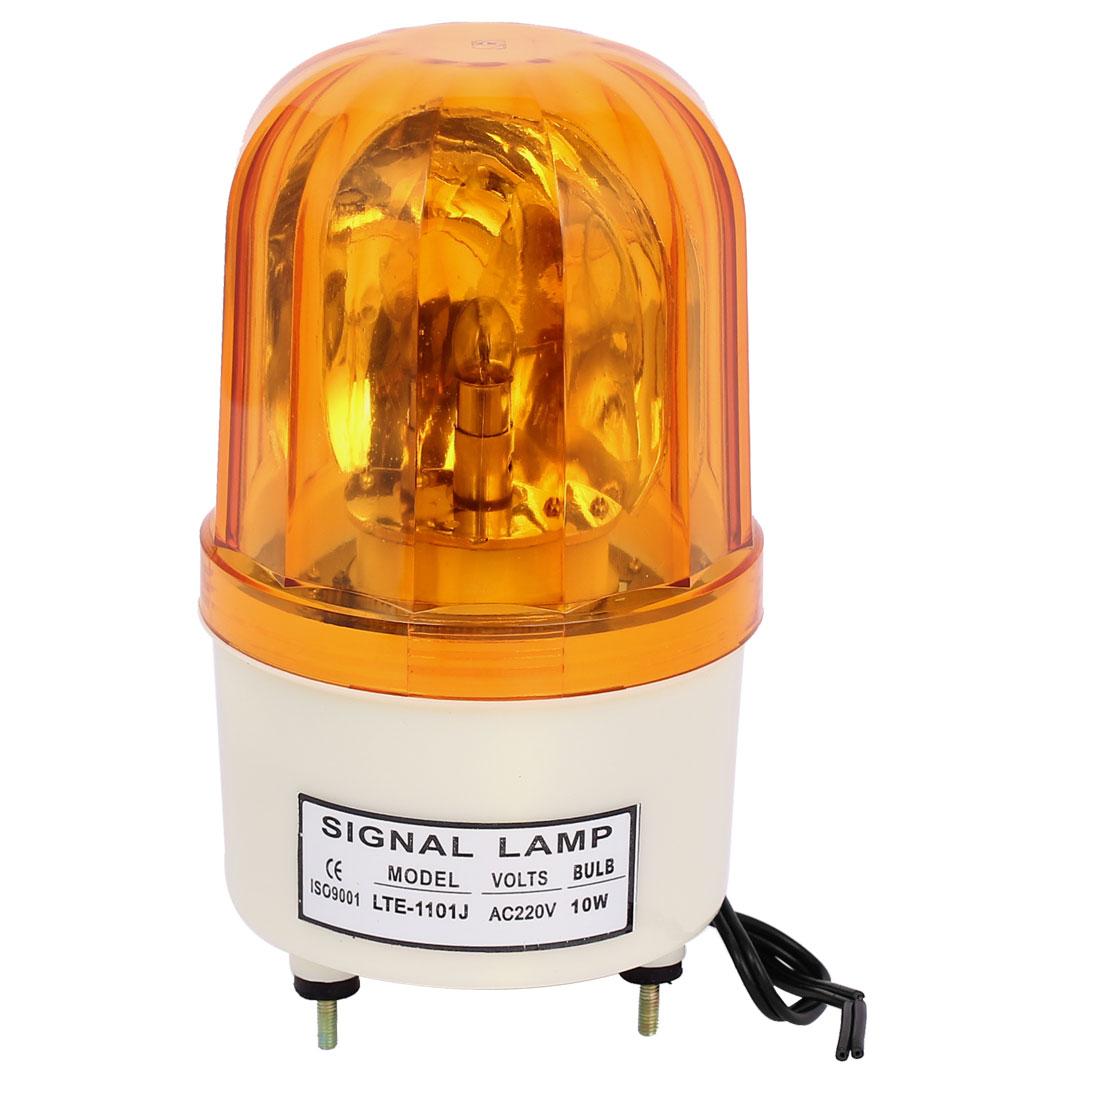 AC 220V 10W Industrial Safety Rotary Lamp Strobe Signal Warning Flashing Light Yellow